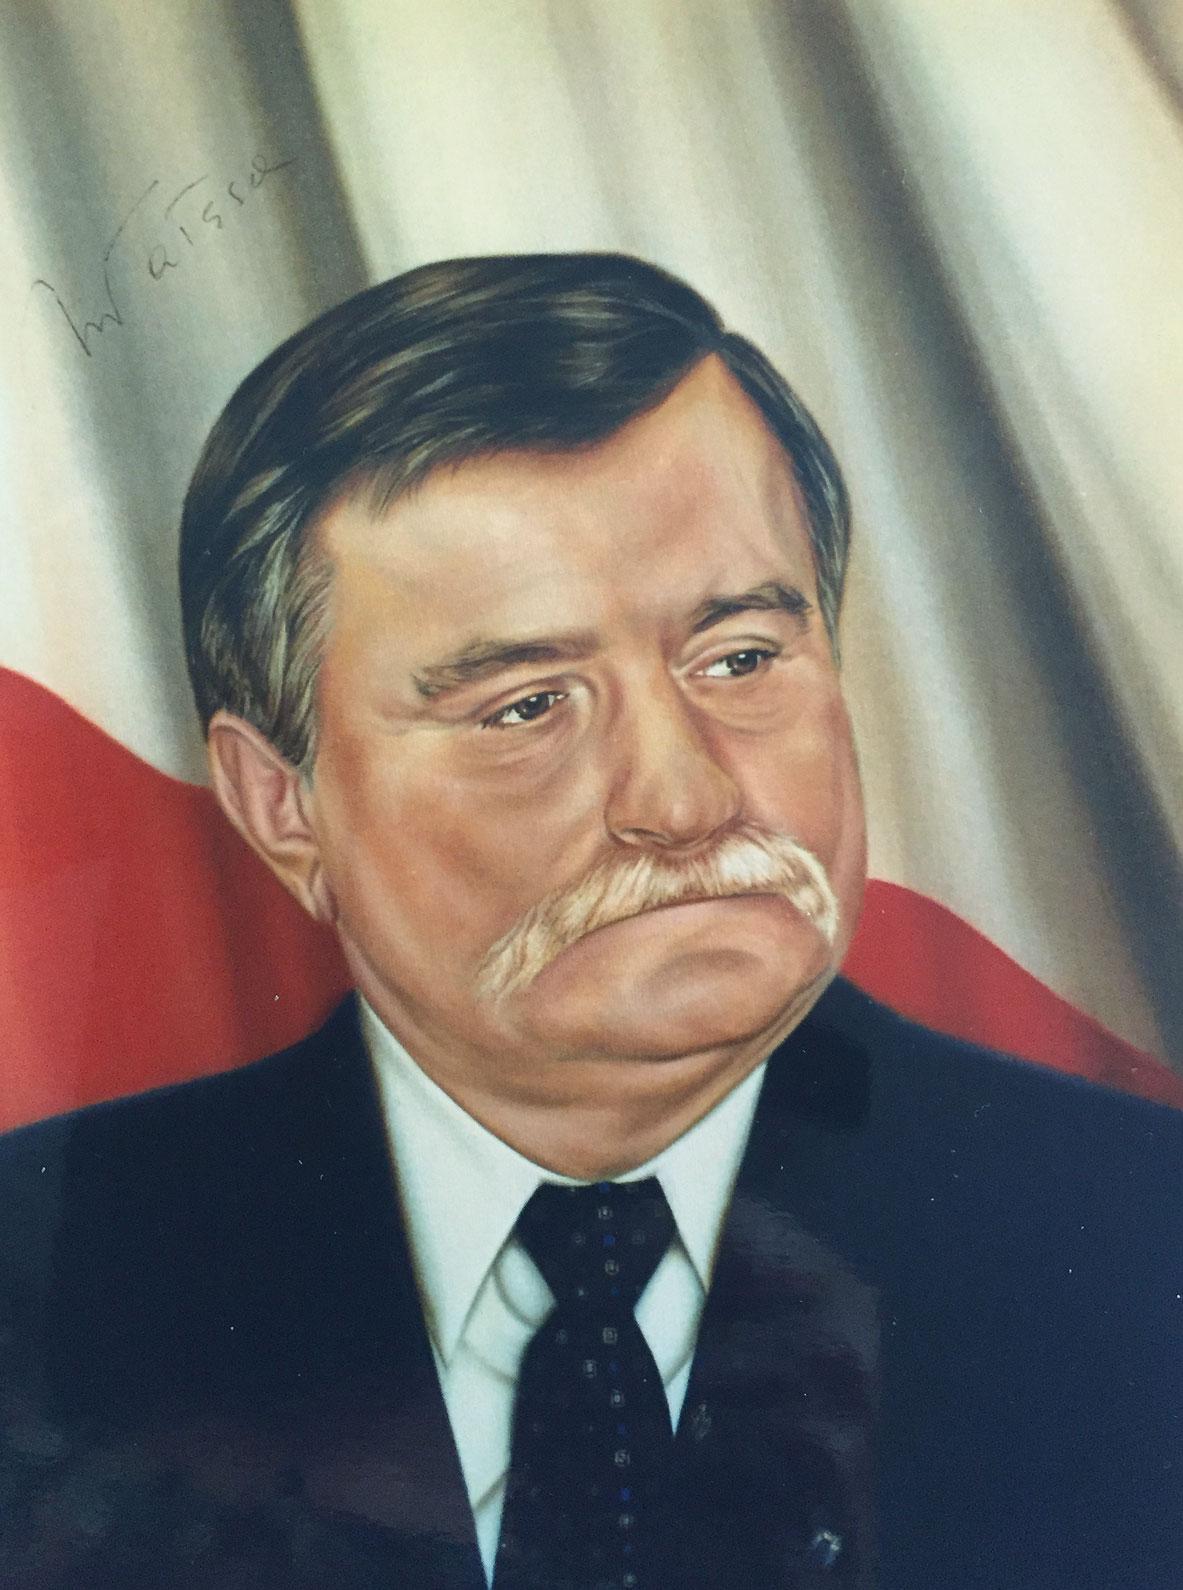 Portrait of Lech Walesa former president of Poland